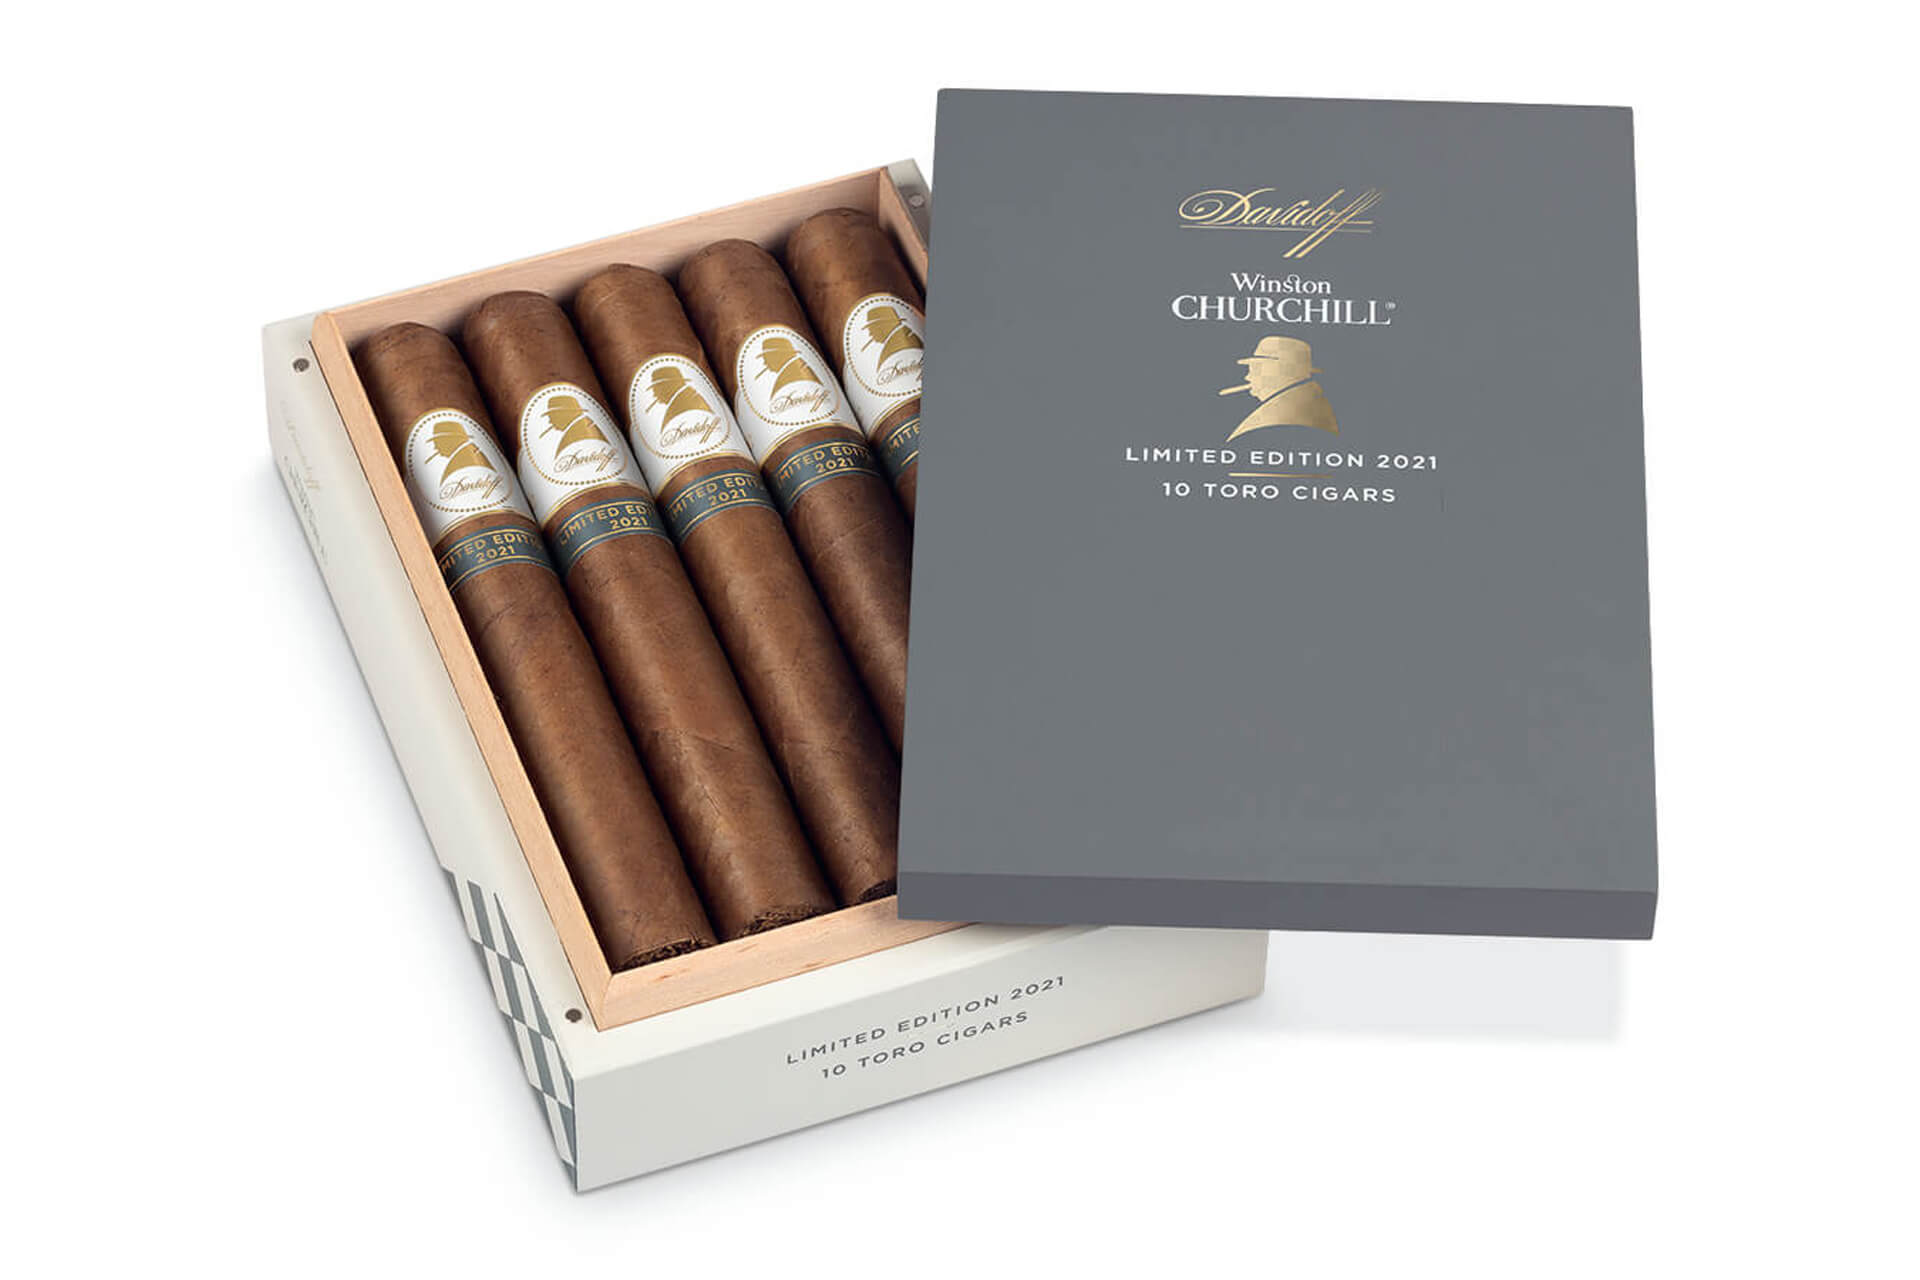 Winston Churchill Toro Limited Edition 2021